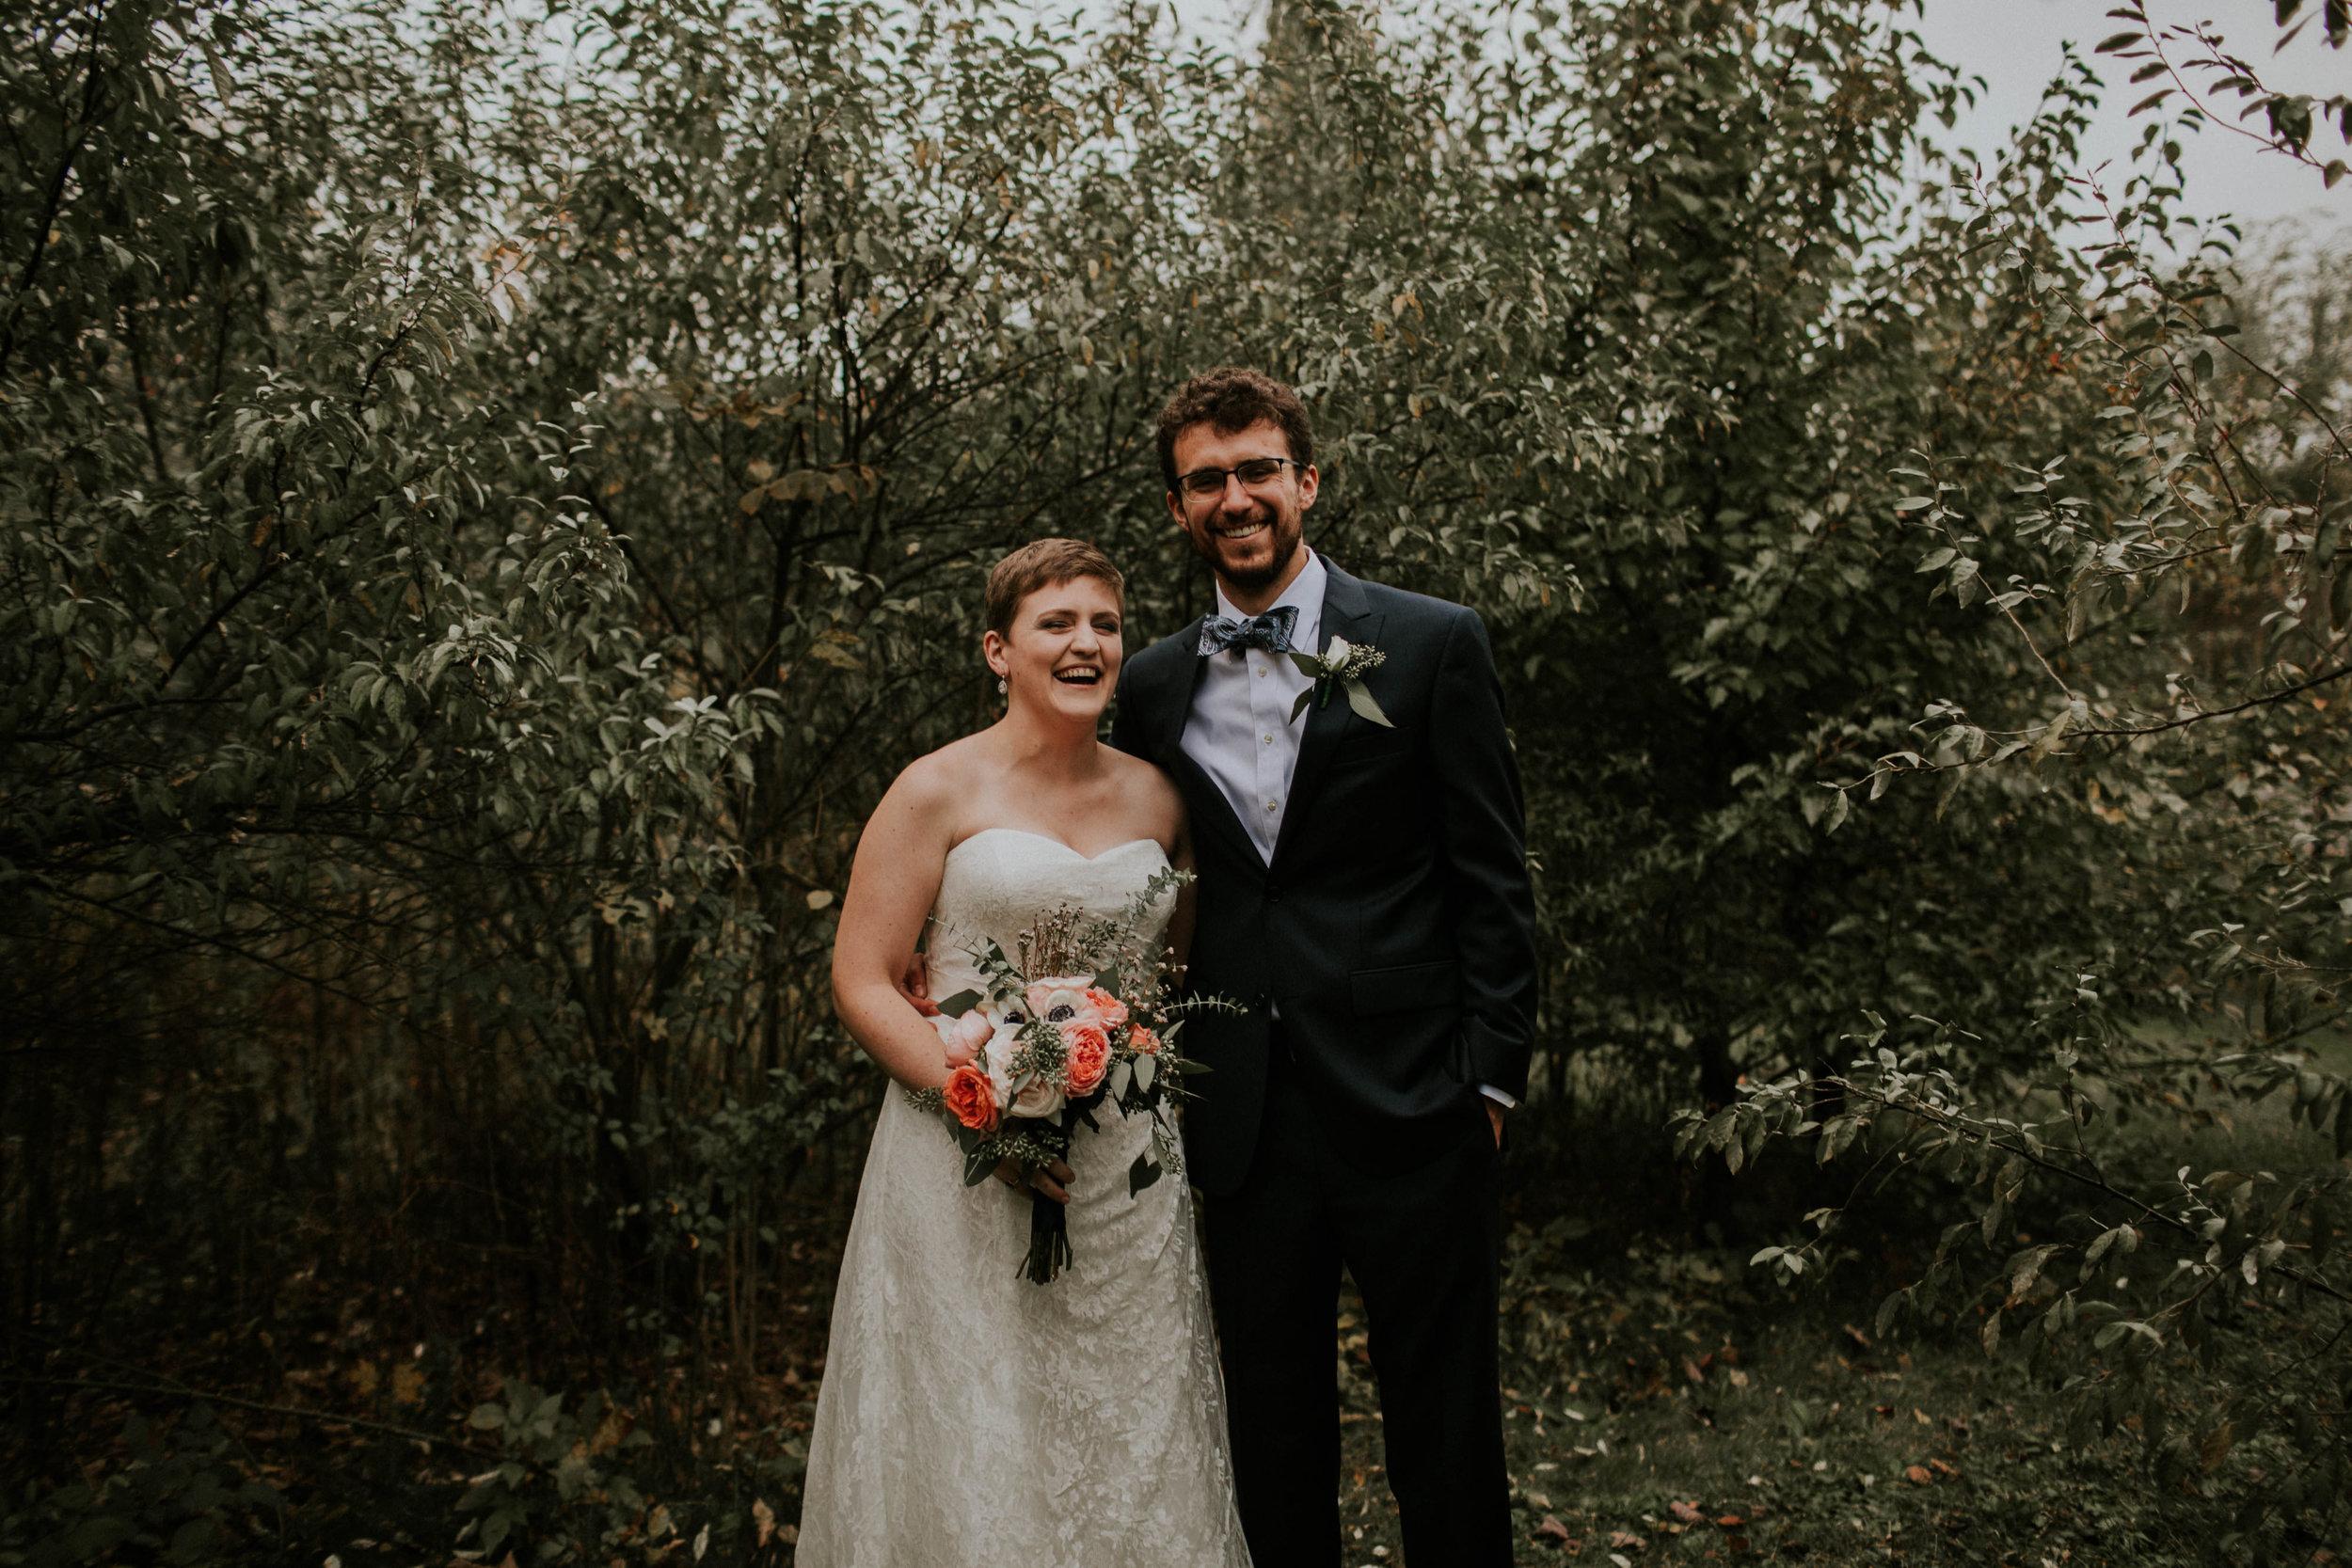 Columbus ohio wedding photographer grace e jones photography real fun joyful wedding34.jpg